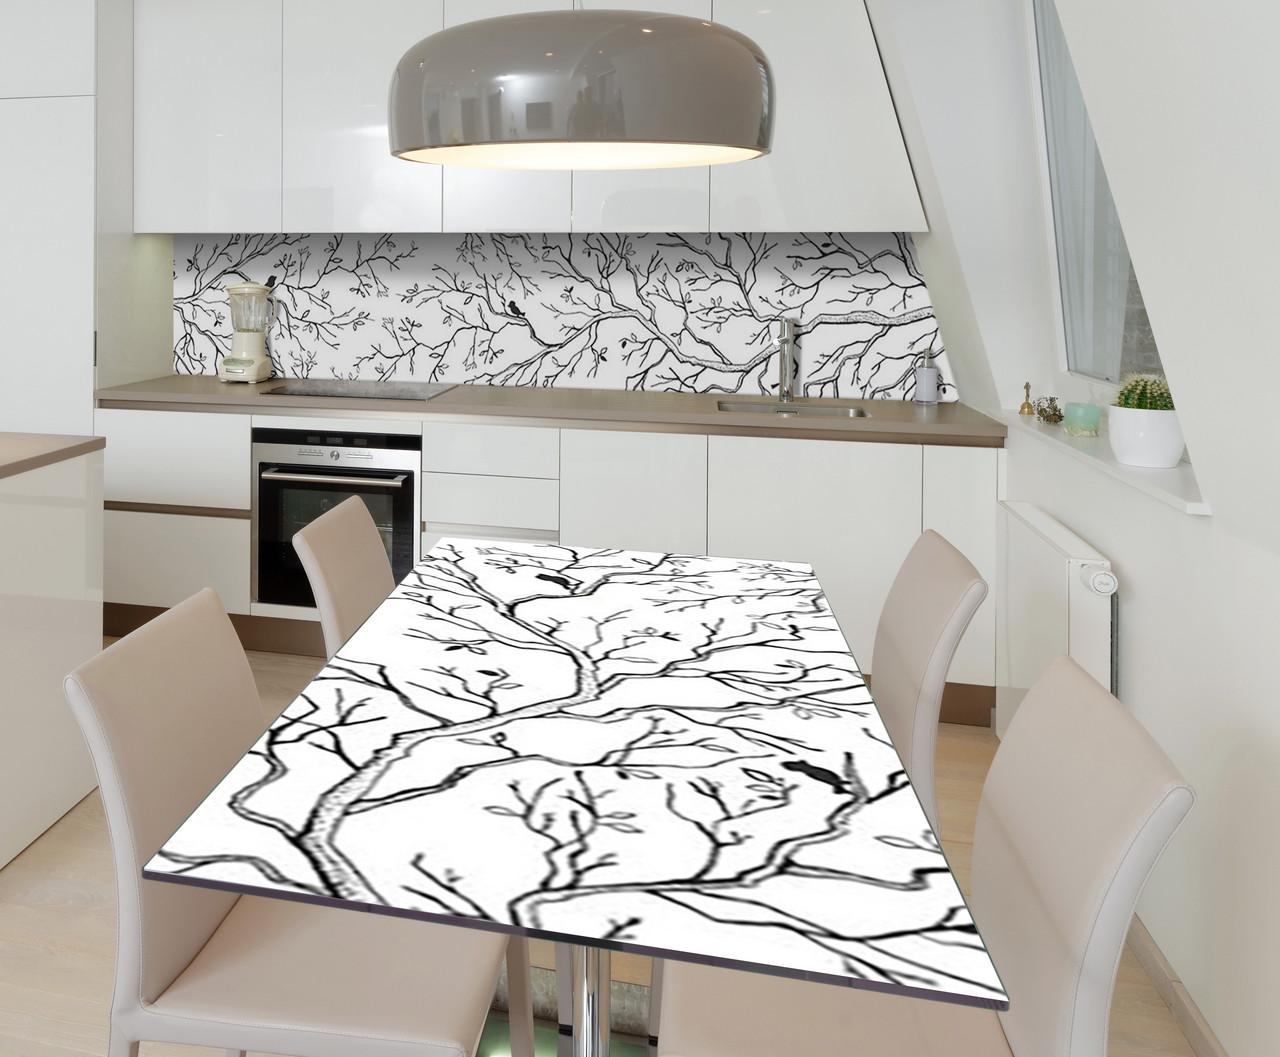 Наклейка 3Д виниловая на стол Zatarga «Утренняя песня» 600х1200 мм для домов, квартир, столов, кофейн, кафе